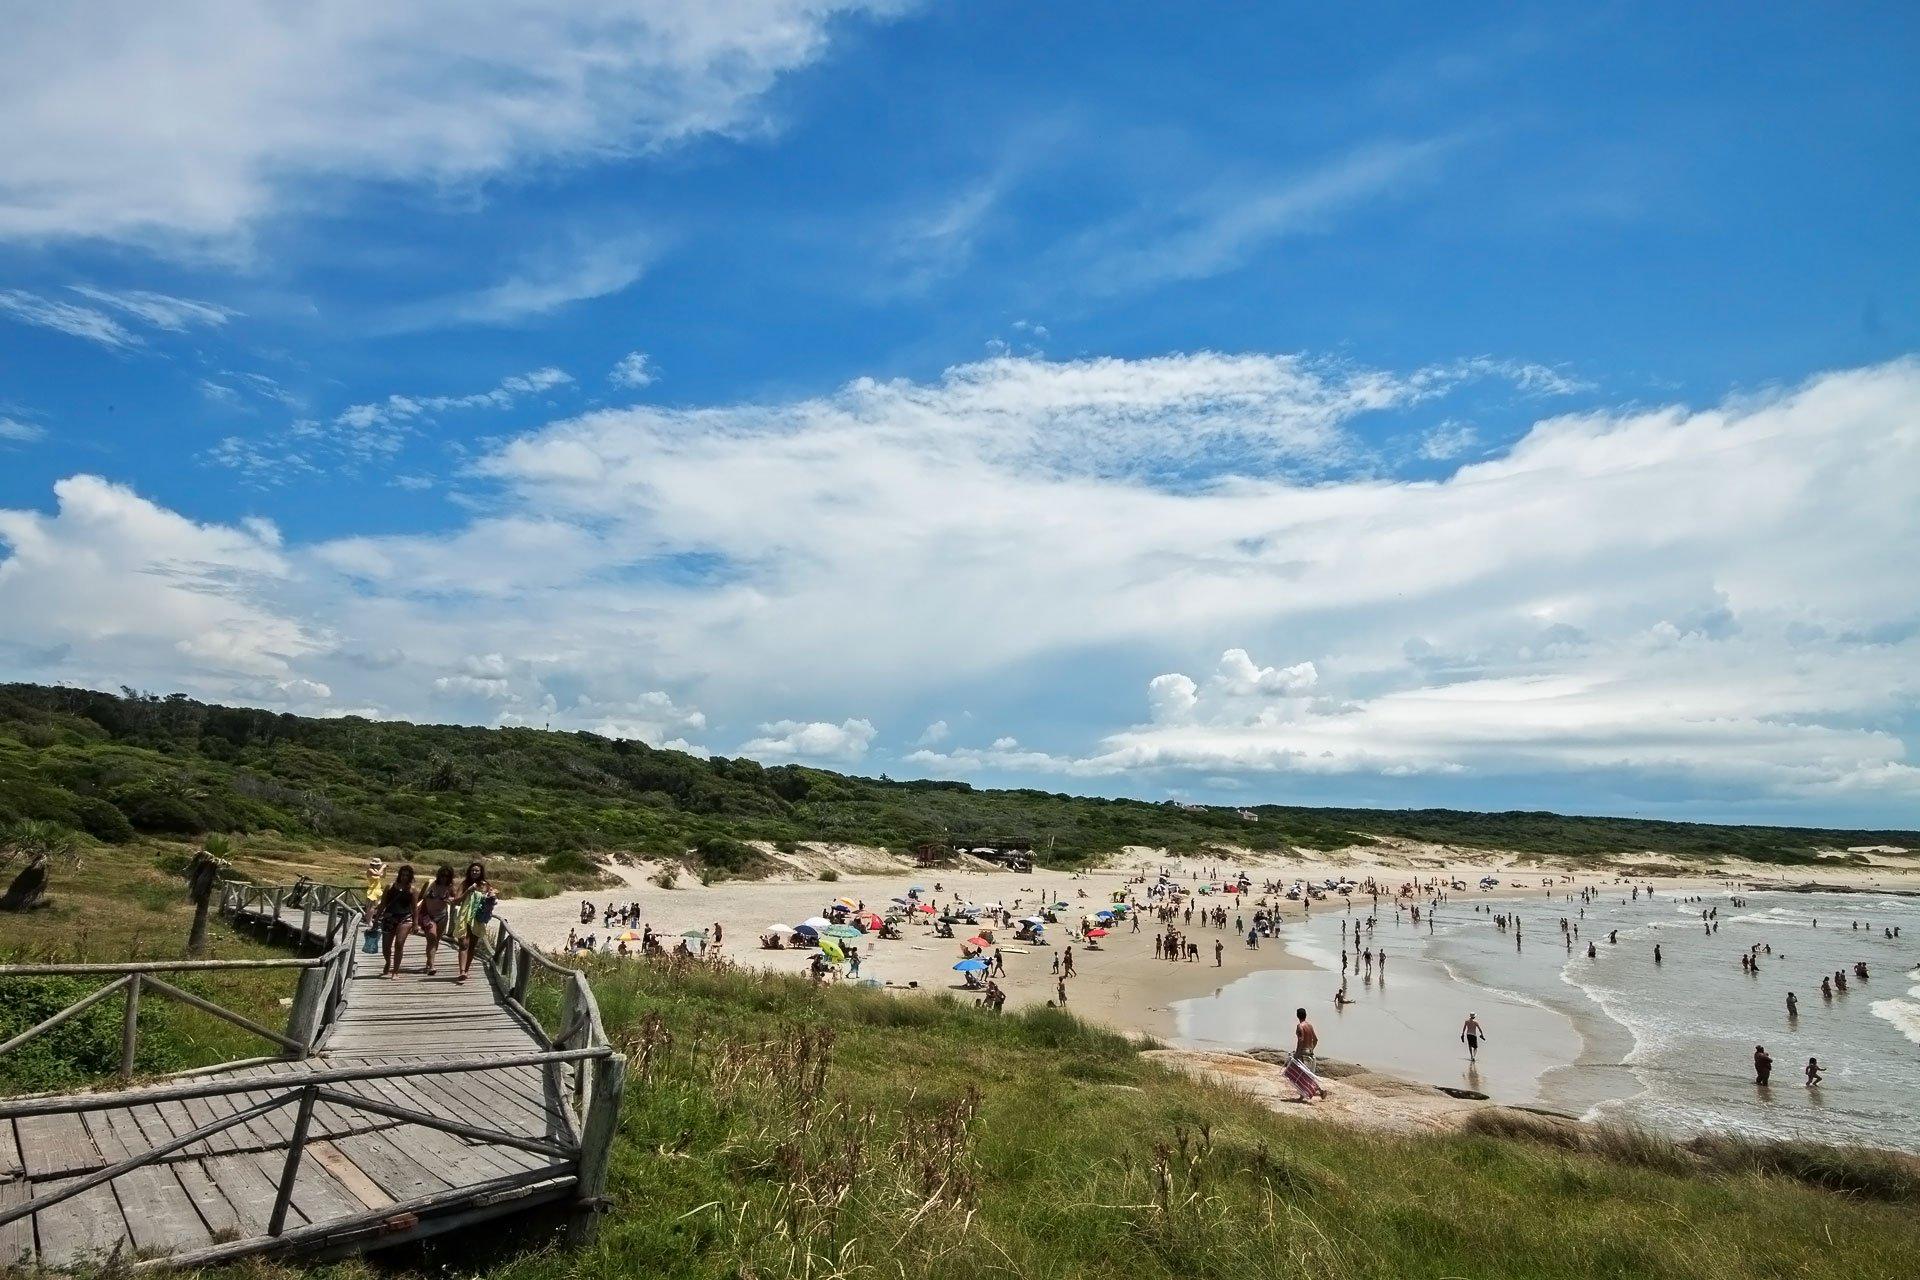 Parque Nacional de Santa Teresa no Uruguai: praia